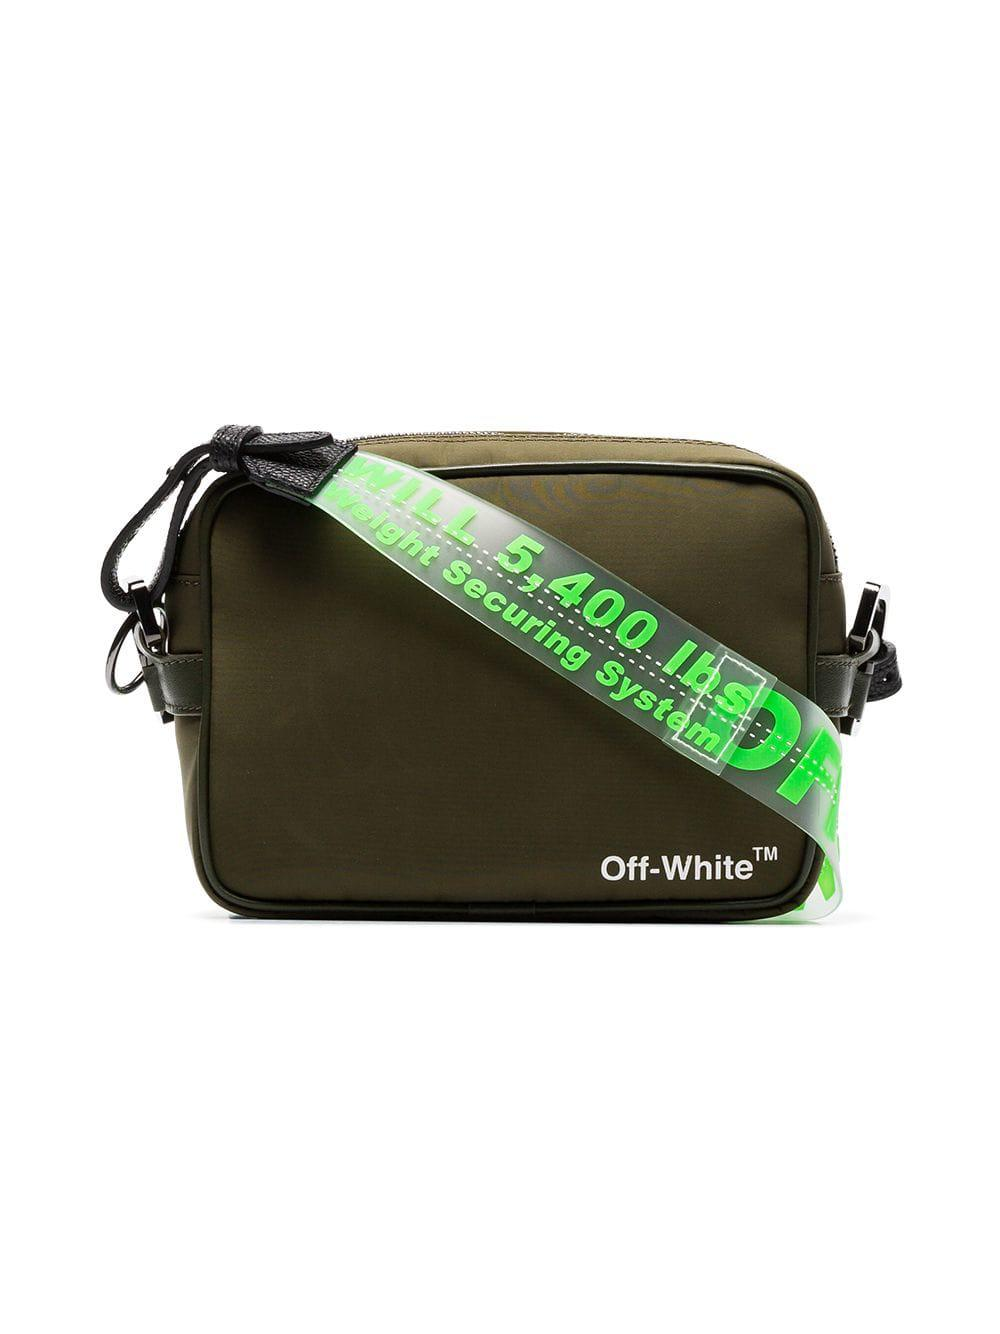 5943587c2f6f Lyst - Off-White c o Virgil Abloh Clear Parcel Tape Pvc Belt Strap in Green  for Men